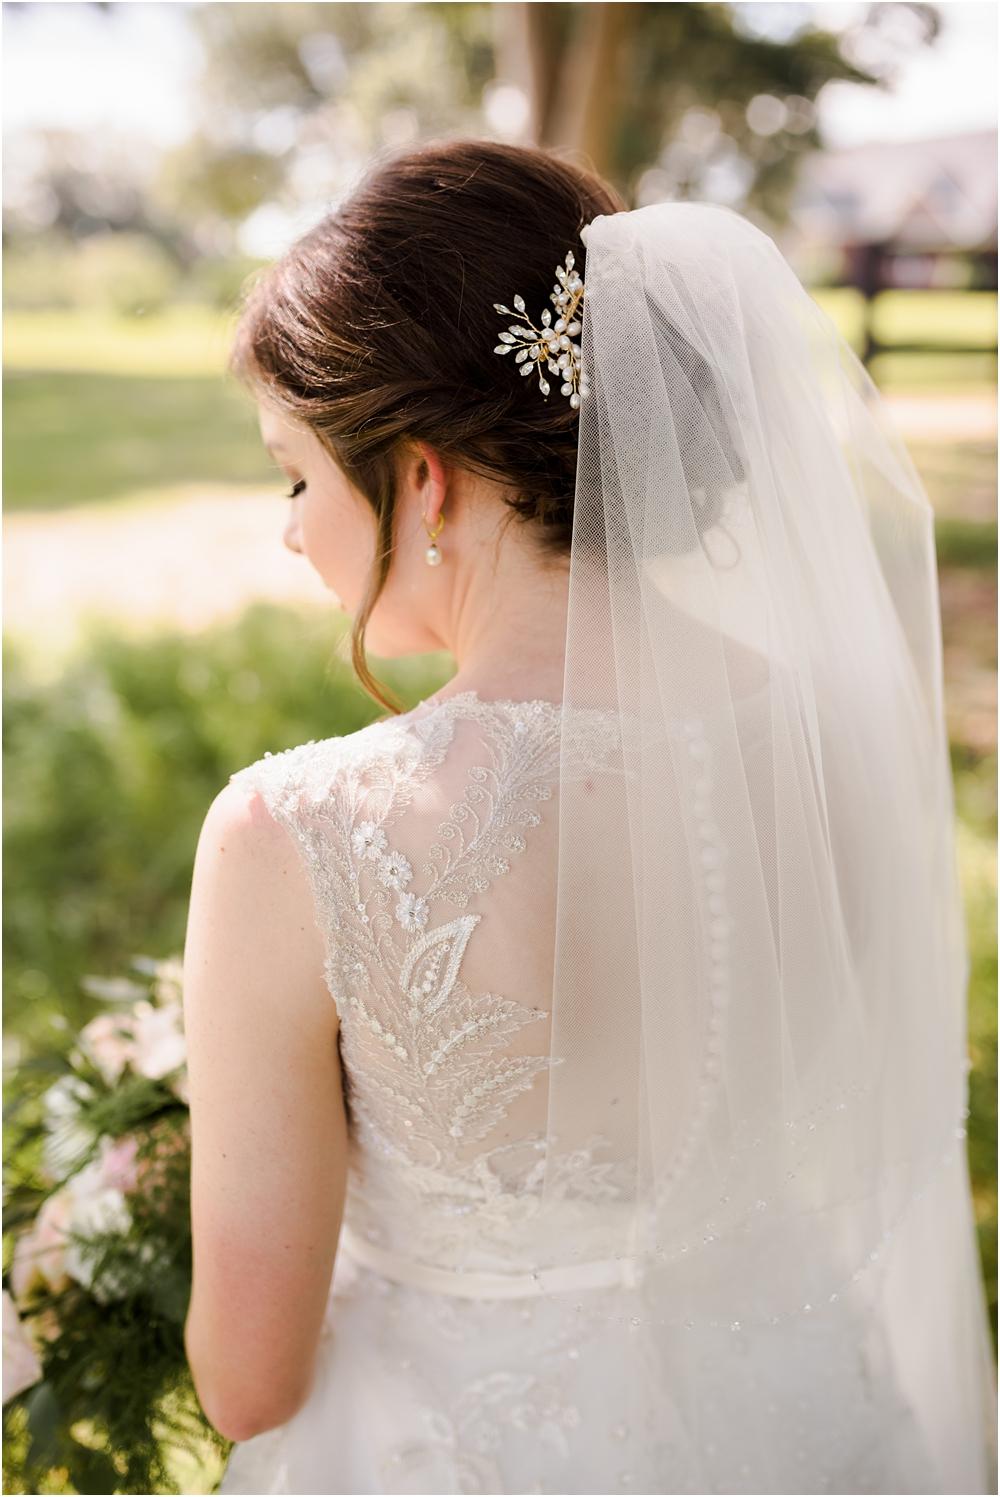 marianna-florida-wedding-photographer-kiersten-grant-44.jpg